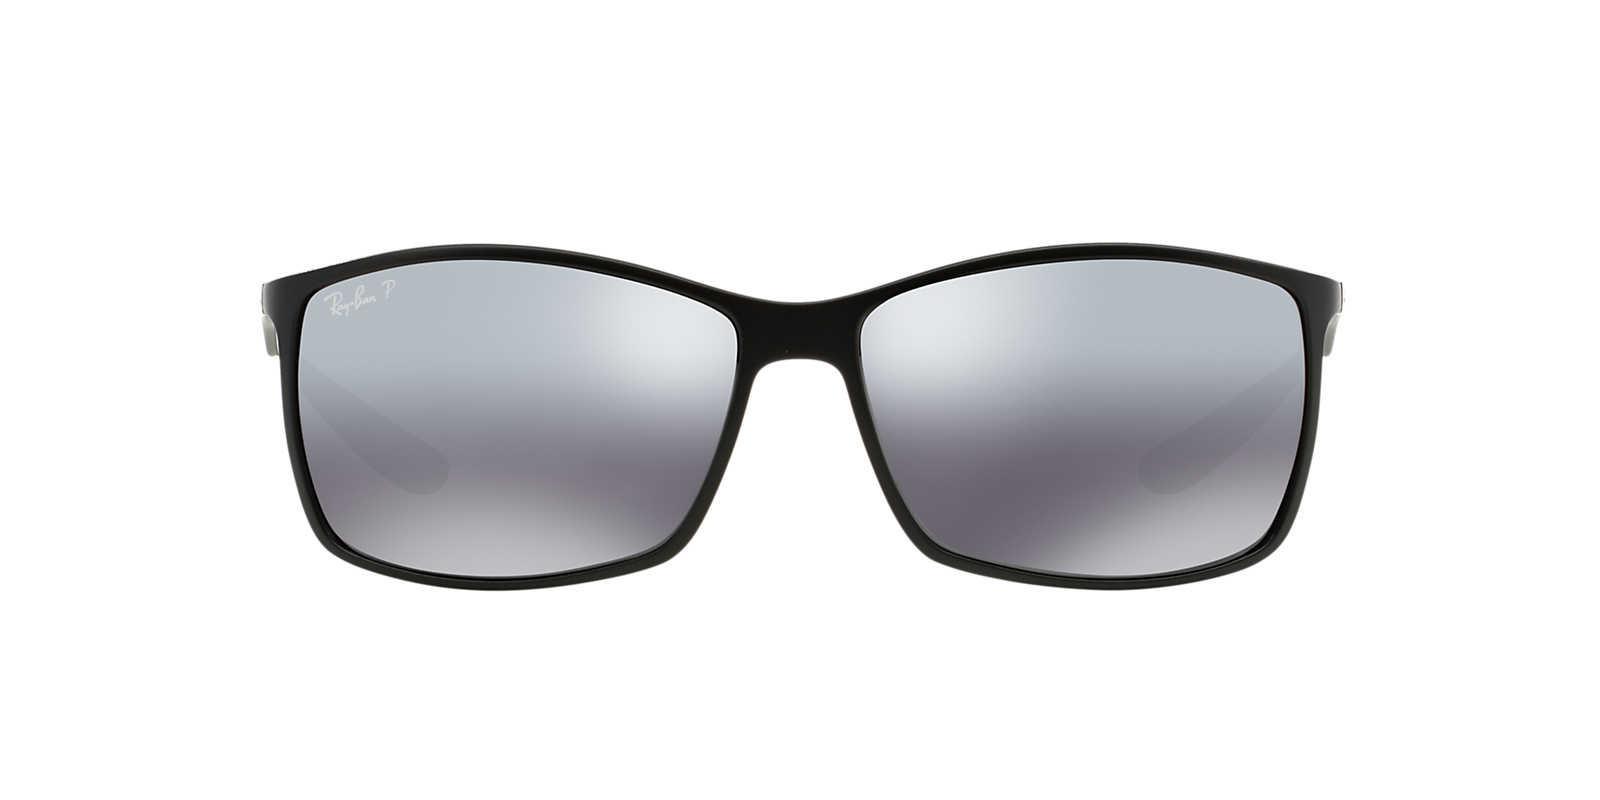 da793b6692 Ray-Ban - Metallic Sunglass Rb4179 62 Liteforce for Men - Lyst. View  fullscreen